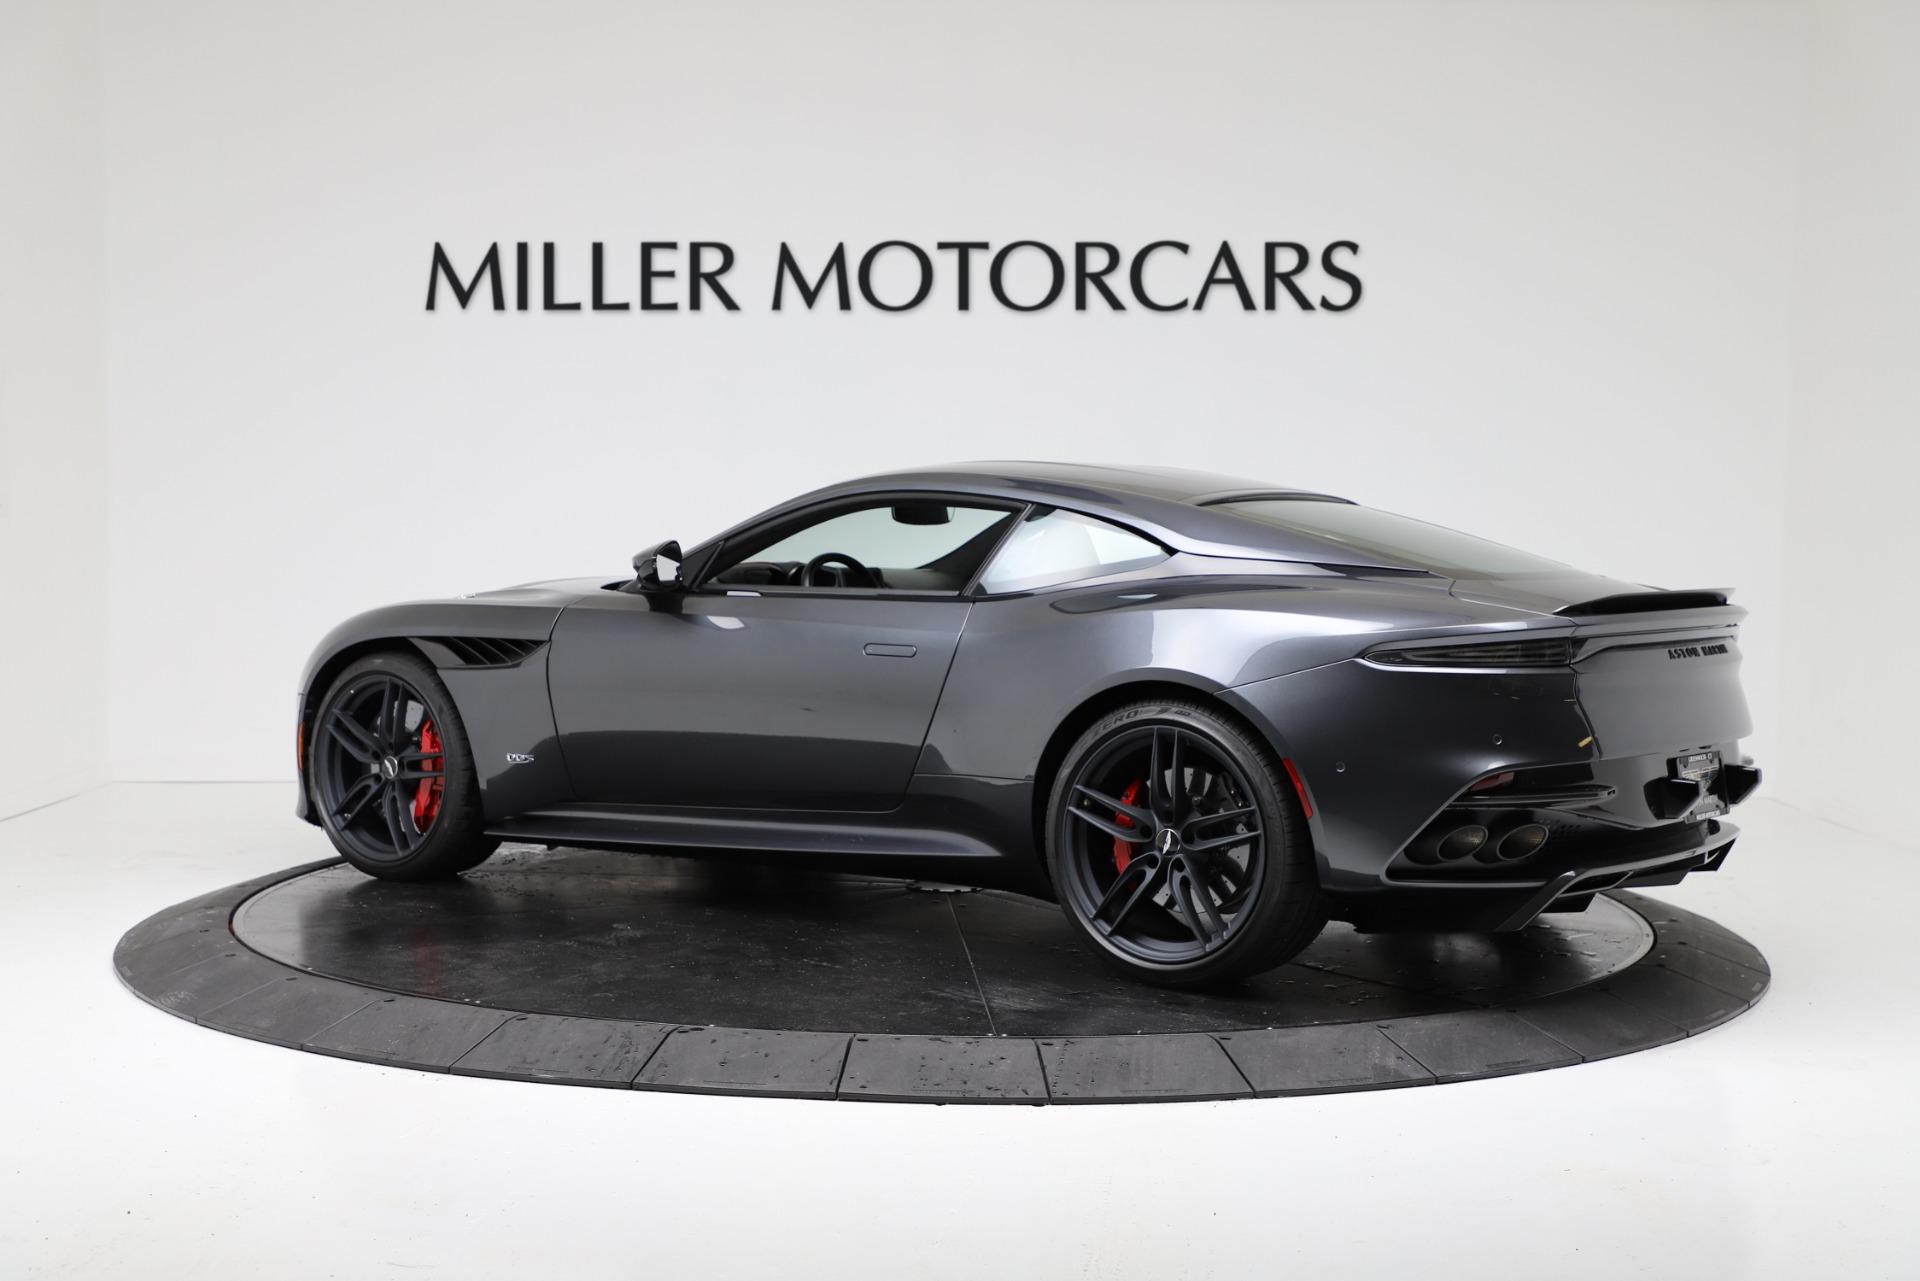 New 2019 Aston Martin DBS Superleggera For Sale In Westport, CT 3318_p4